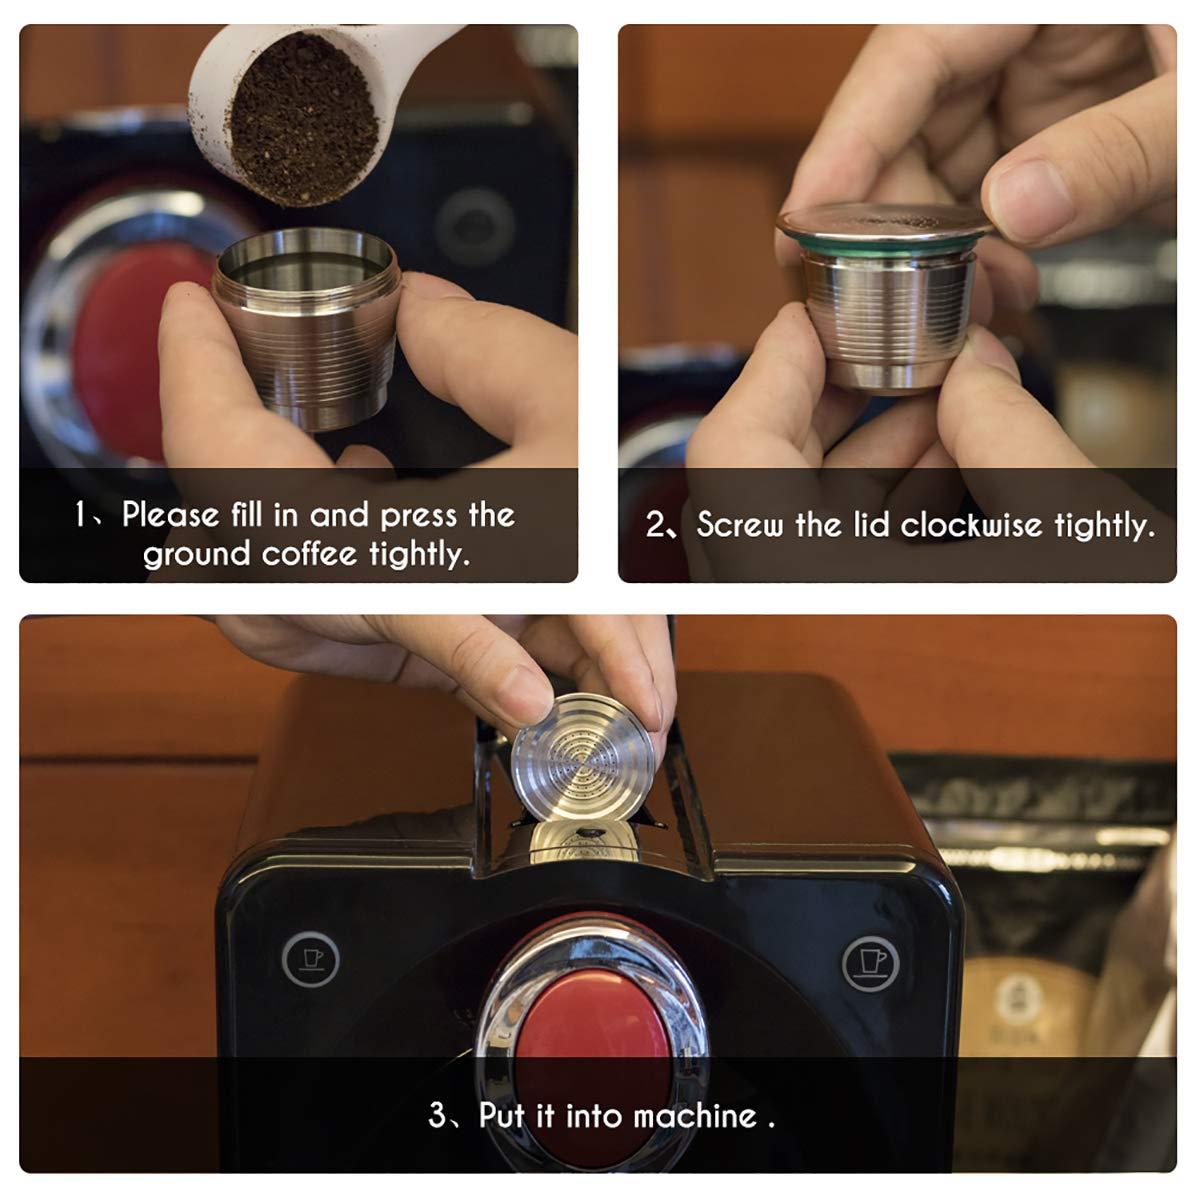 inkl nachf/üllbar Konesky Kaffeekapseltasse aus Edelstahl Pinsel und L/öffel wiederverwendbar